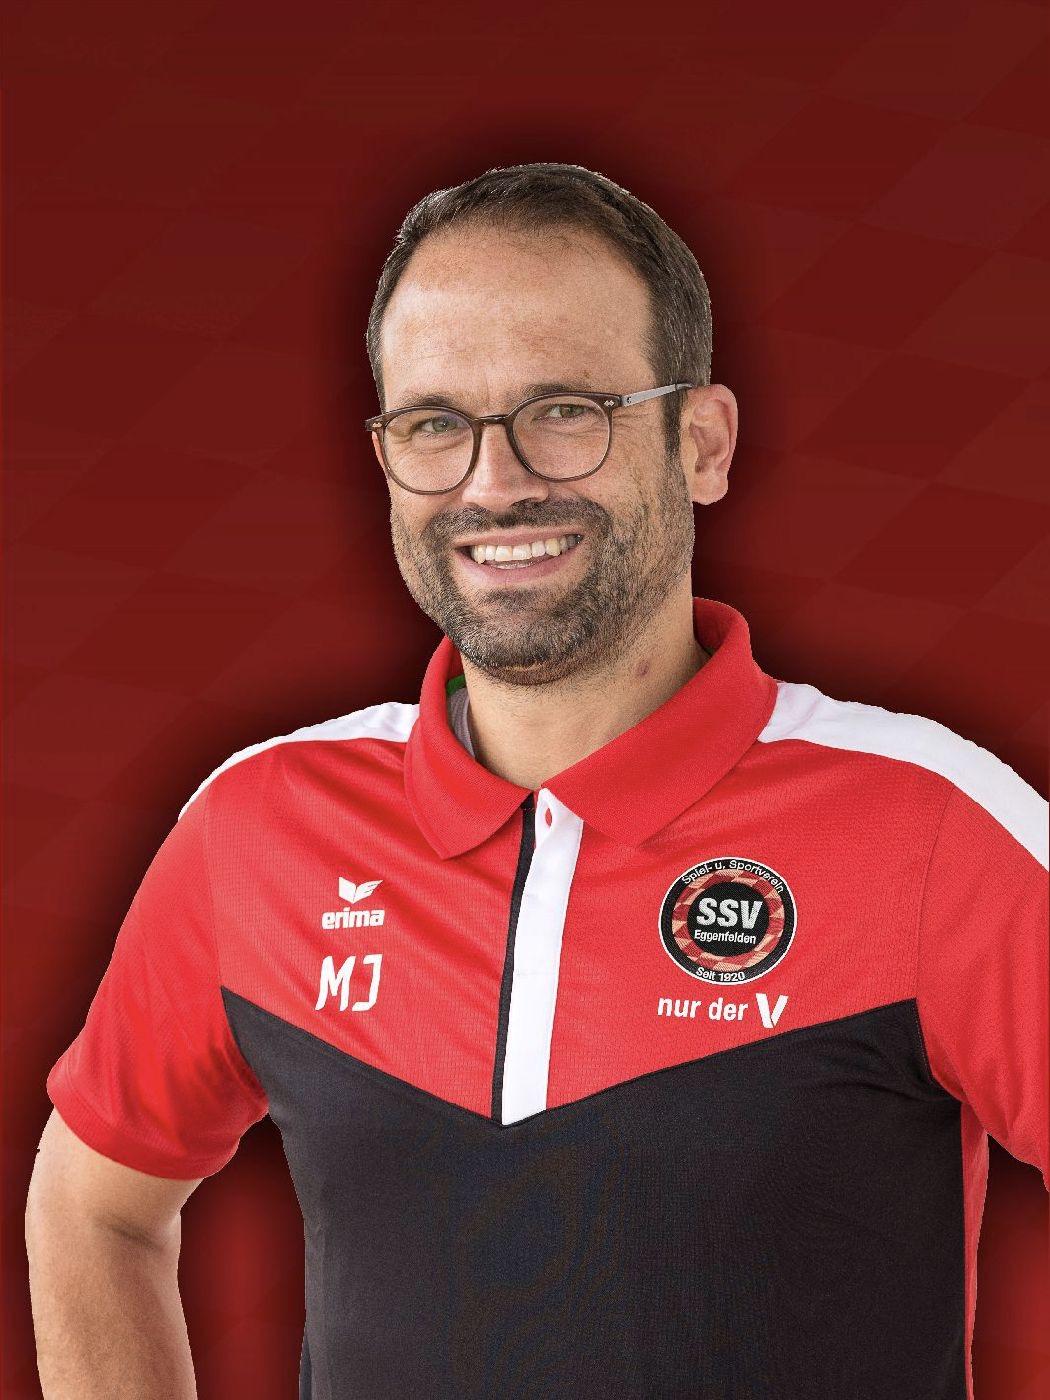 Markus Jungbauer